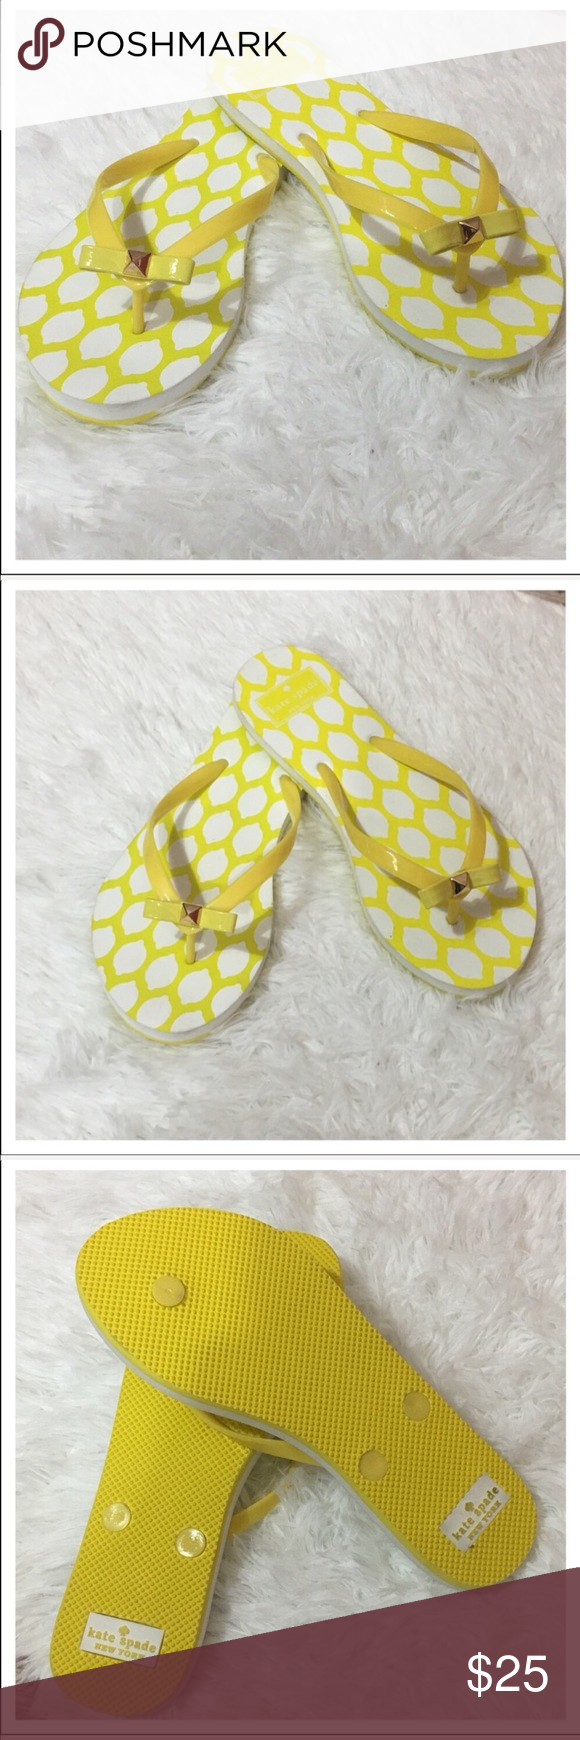 f0139500c5d NWOB Kate Spade Nova EVA Flip Flops - Yellow Lemon NWOB Kate Spade Nova EVA  Flip